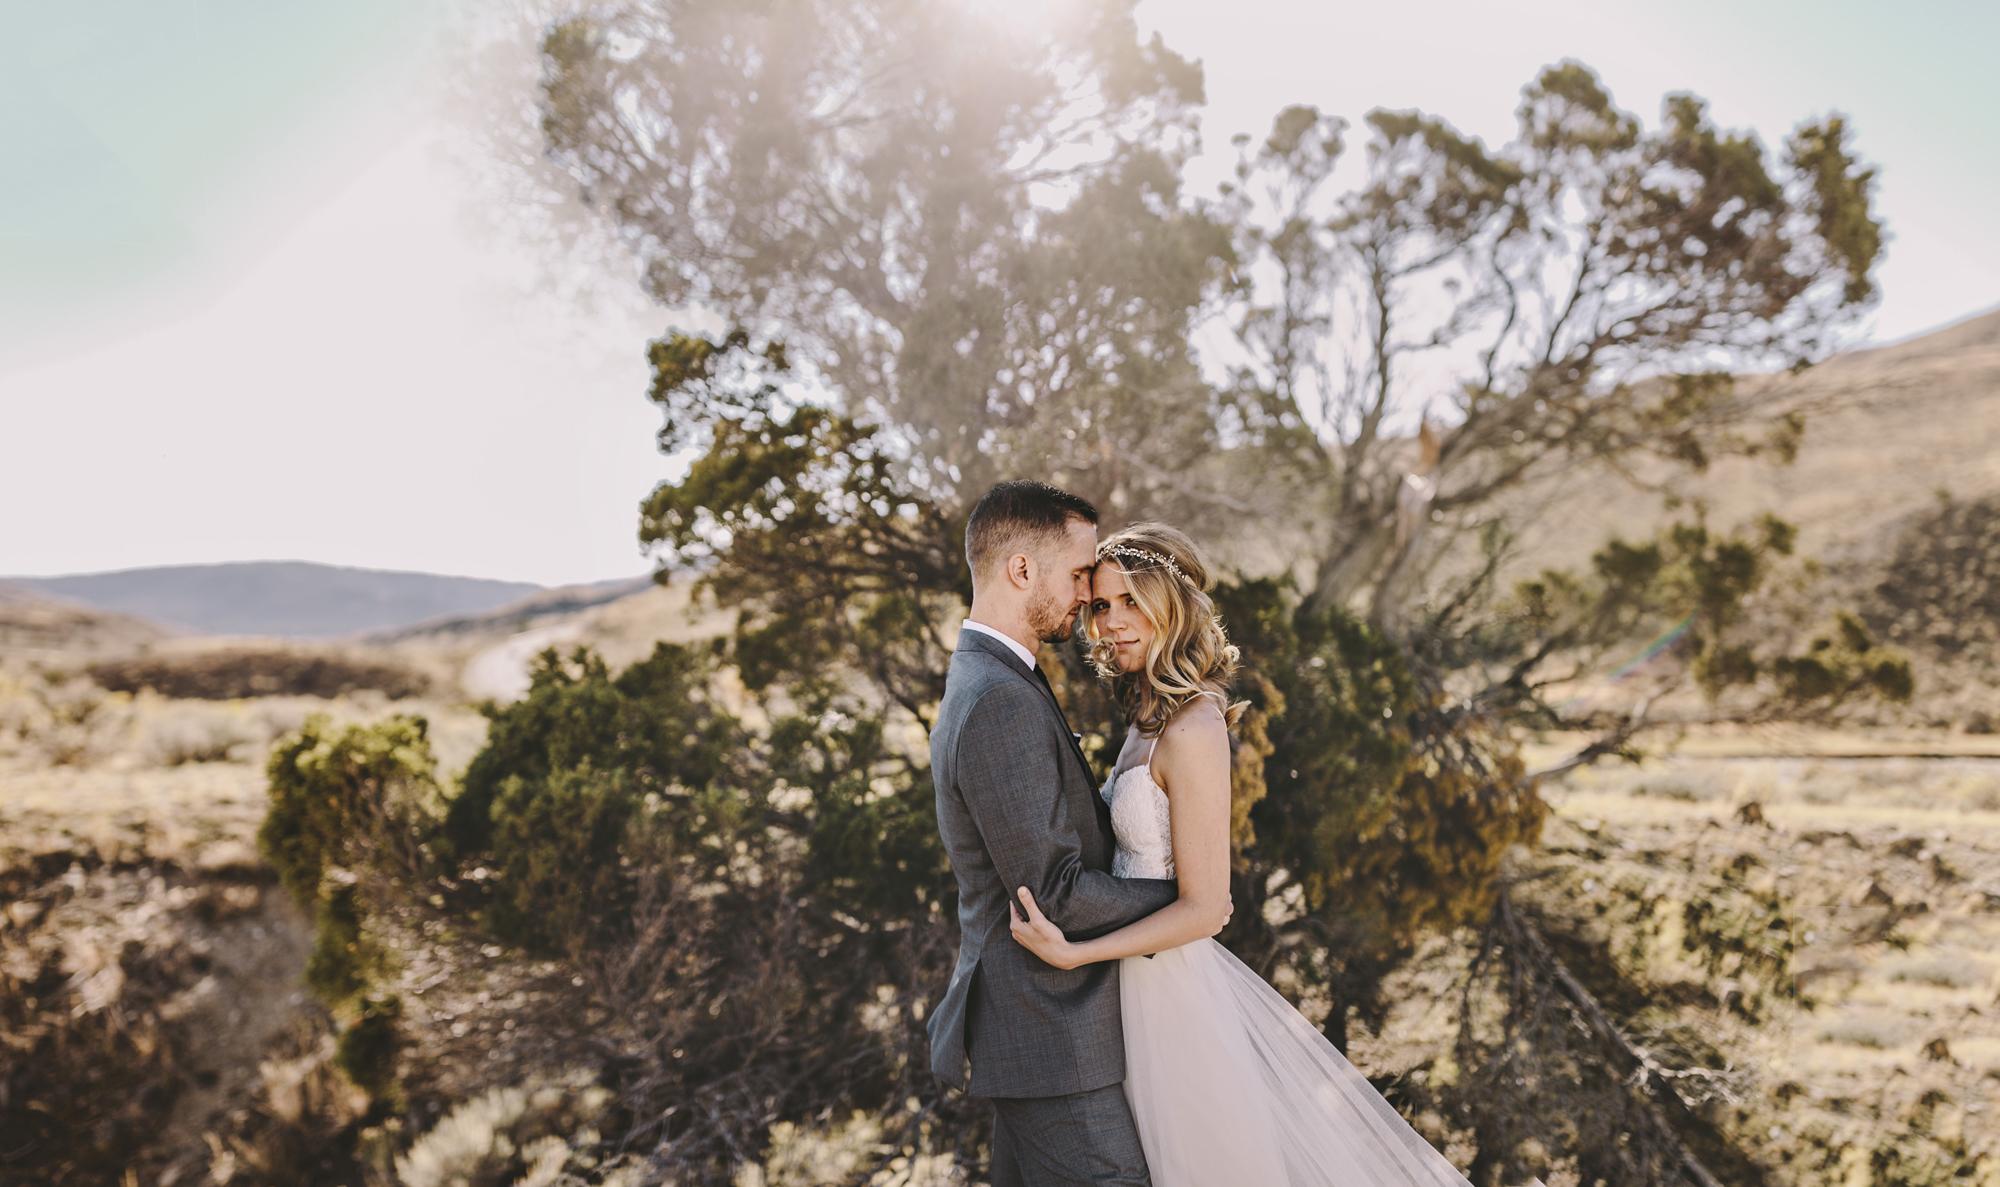 yellowstone national park wedding photographer brandon werth